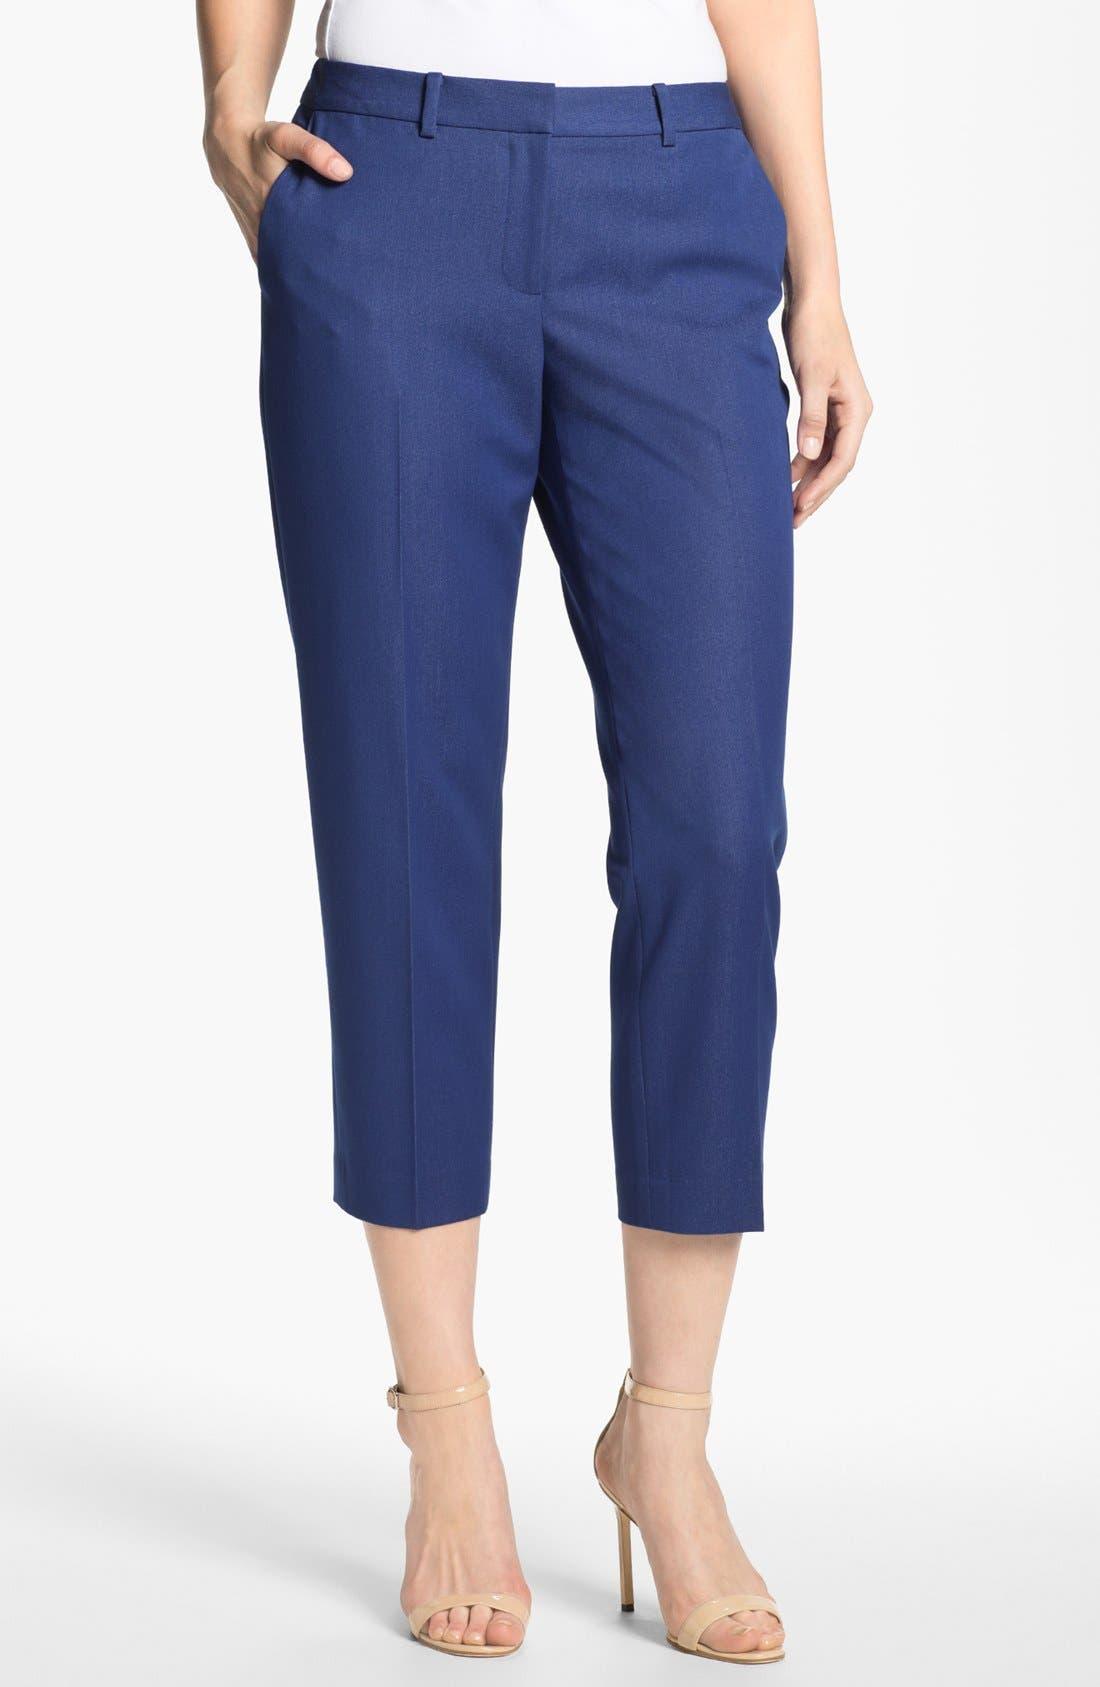 Alternate Image 1 Selected - T Tahari 'Cabana' Crop Pants (Petite) (Online Only)